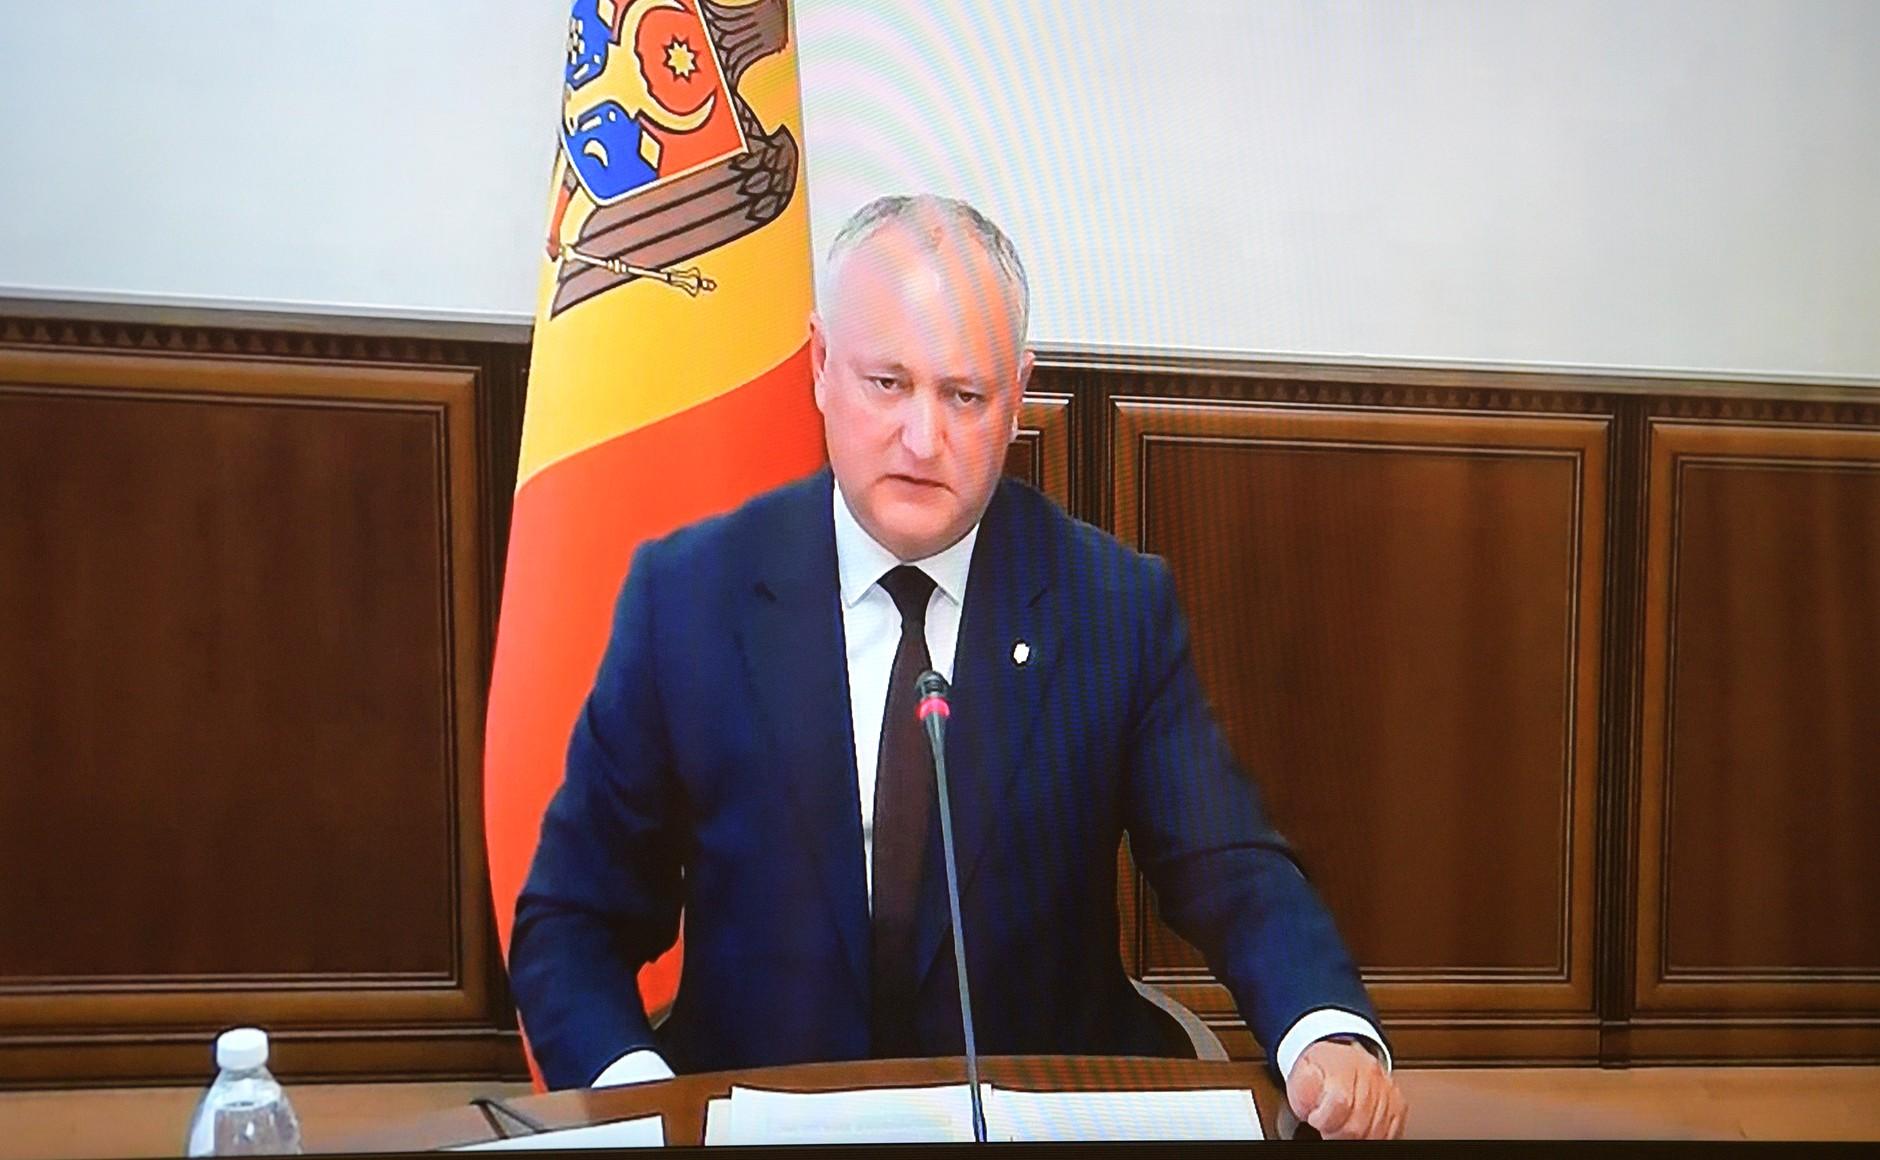 KREMLIN MOLDAVIE PH 5 X 5 DU 28.09.2020 Rencontre avec le président de la Moldavie Igor Dodon (par vidéoconférence). zbOvTACvetDoAQsRc582wHQLA4pivpeR